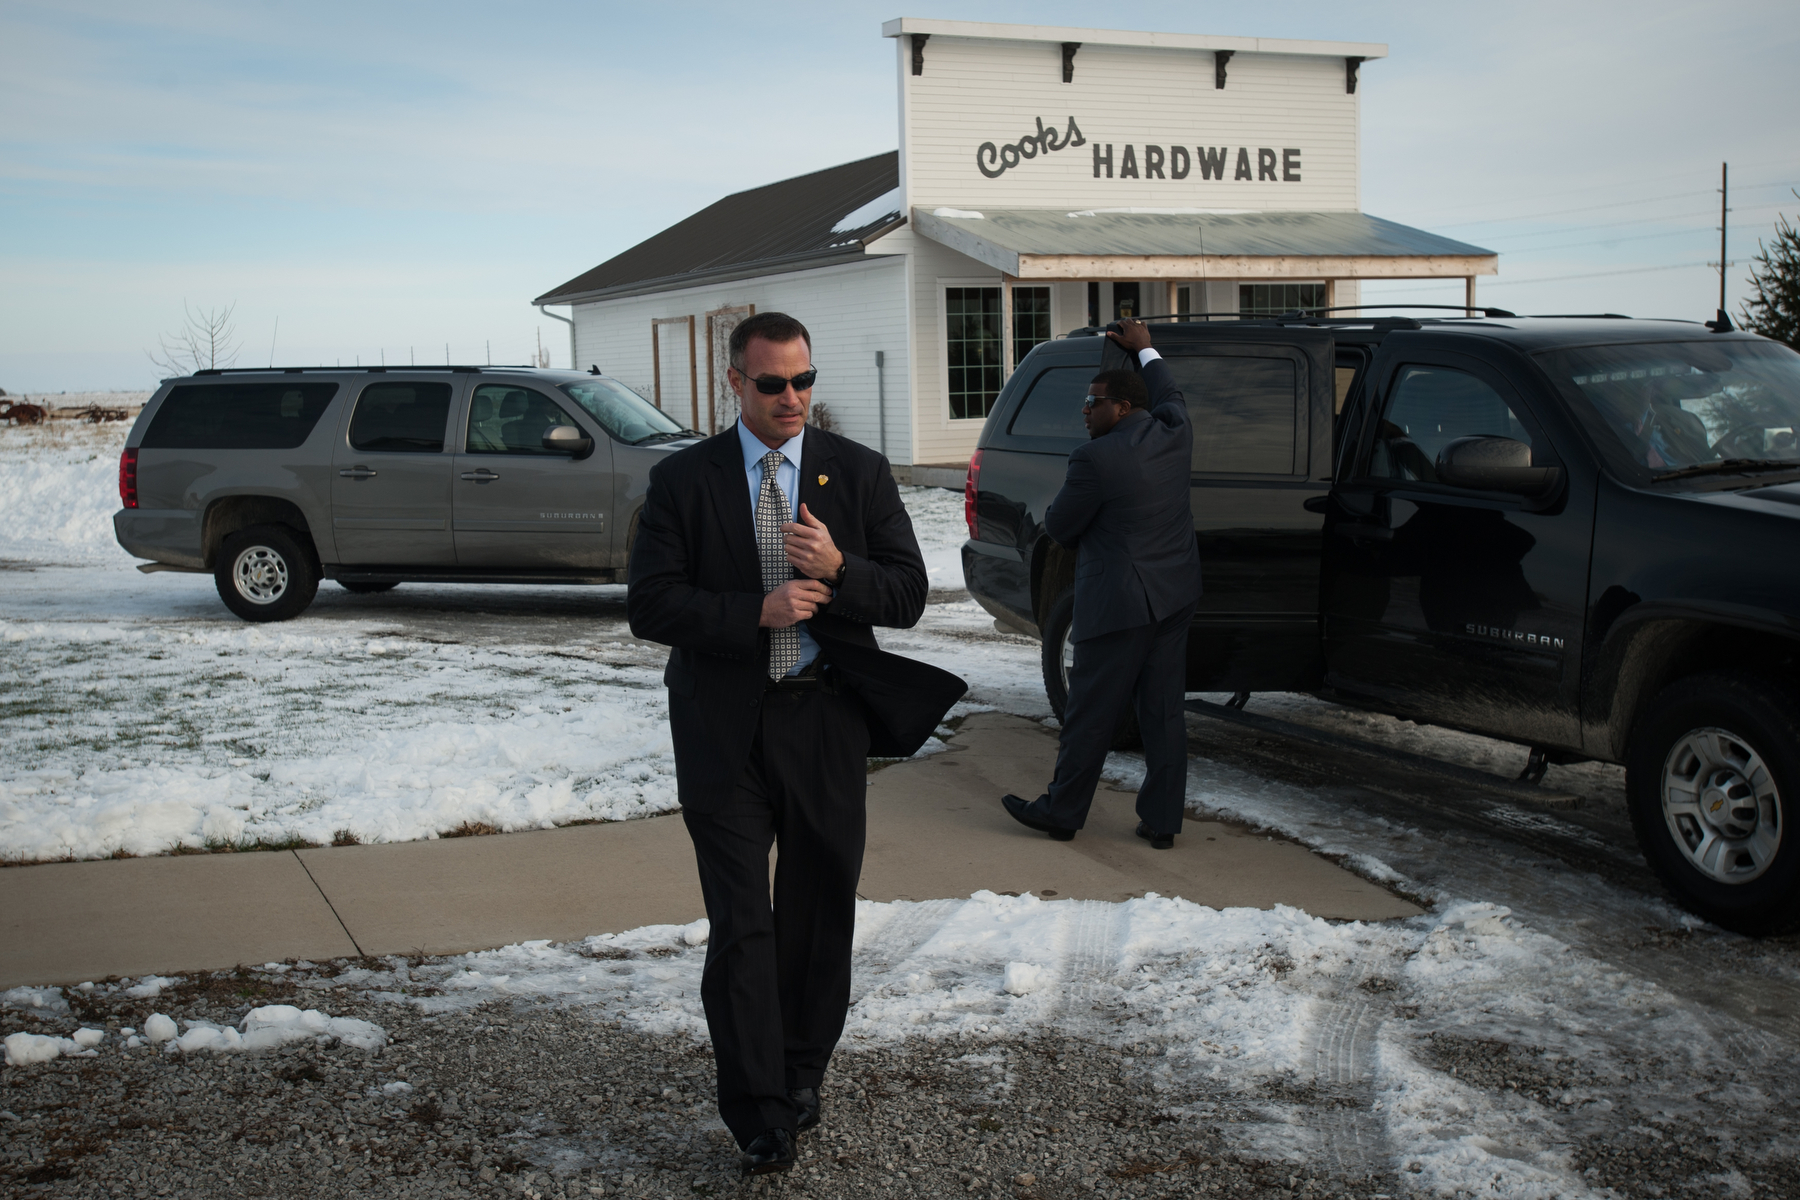 Republican U.S. presidential candidate Ben Carson speaks at South Bethel Church in Tipton, Iowa November 22, 2015. REUTERS/Mark Kauzlarich